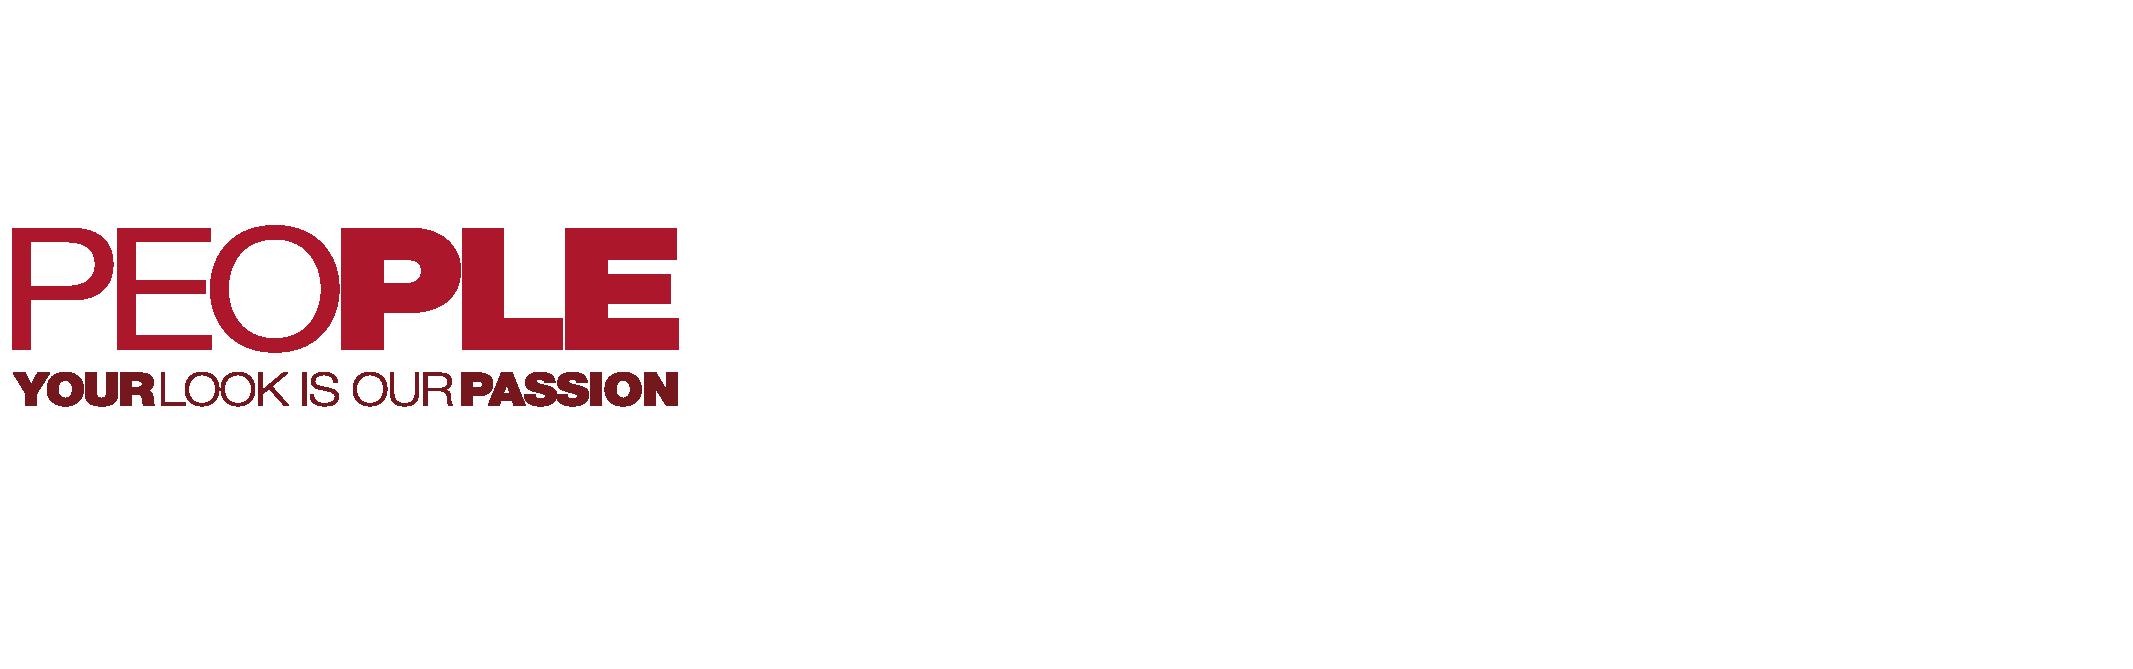 pagina sponsor-04